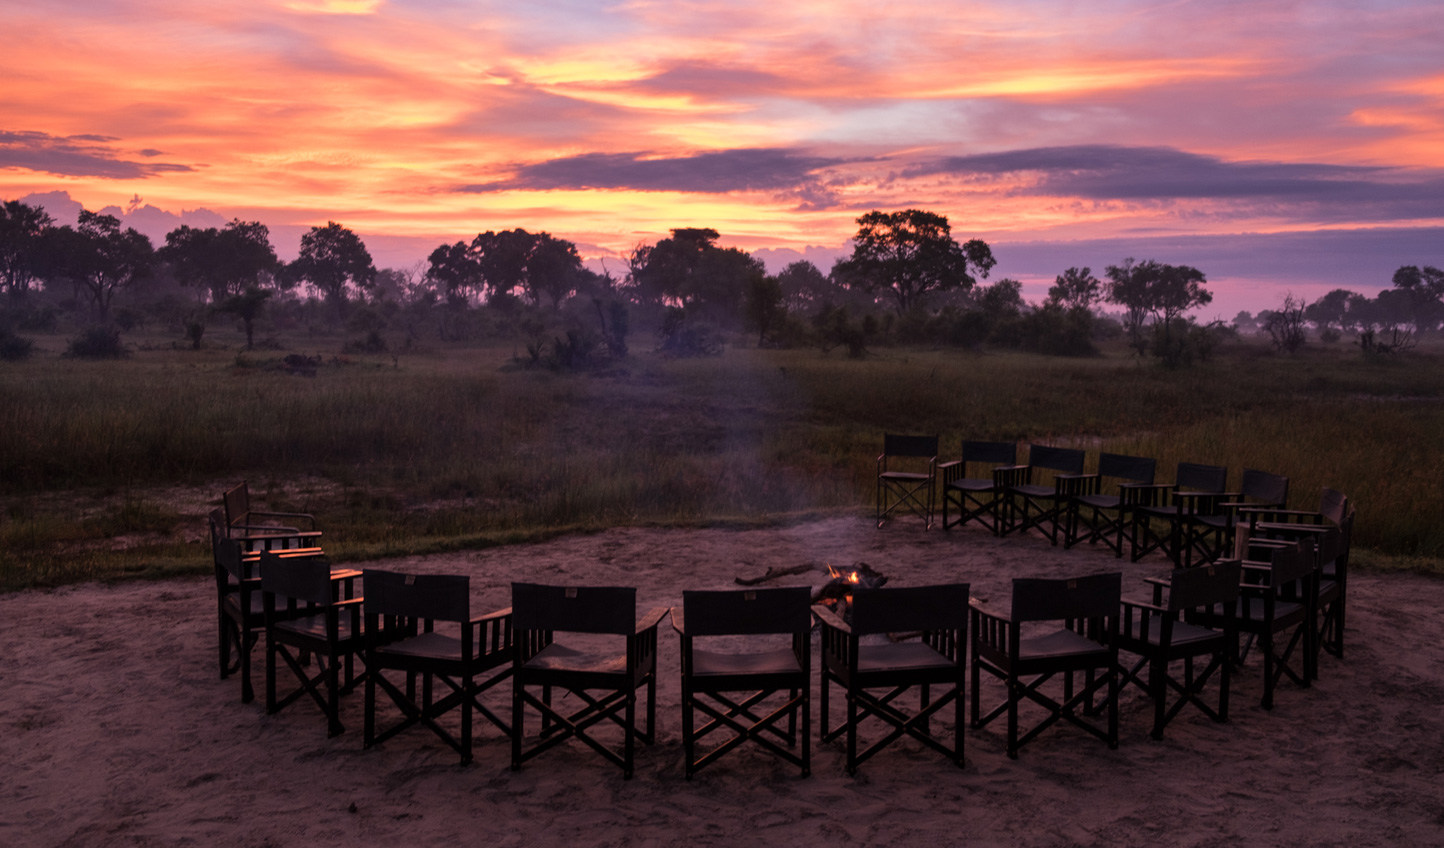 Spend an evening around the camp fire